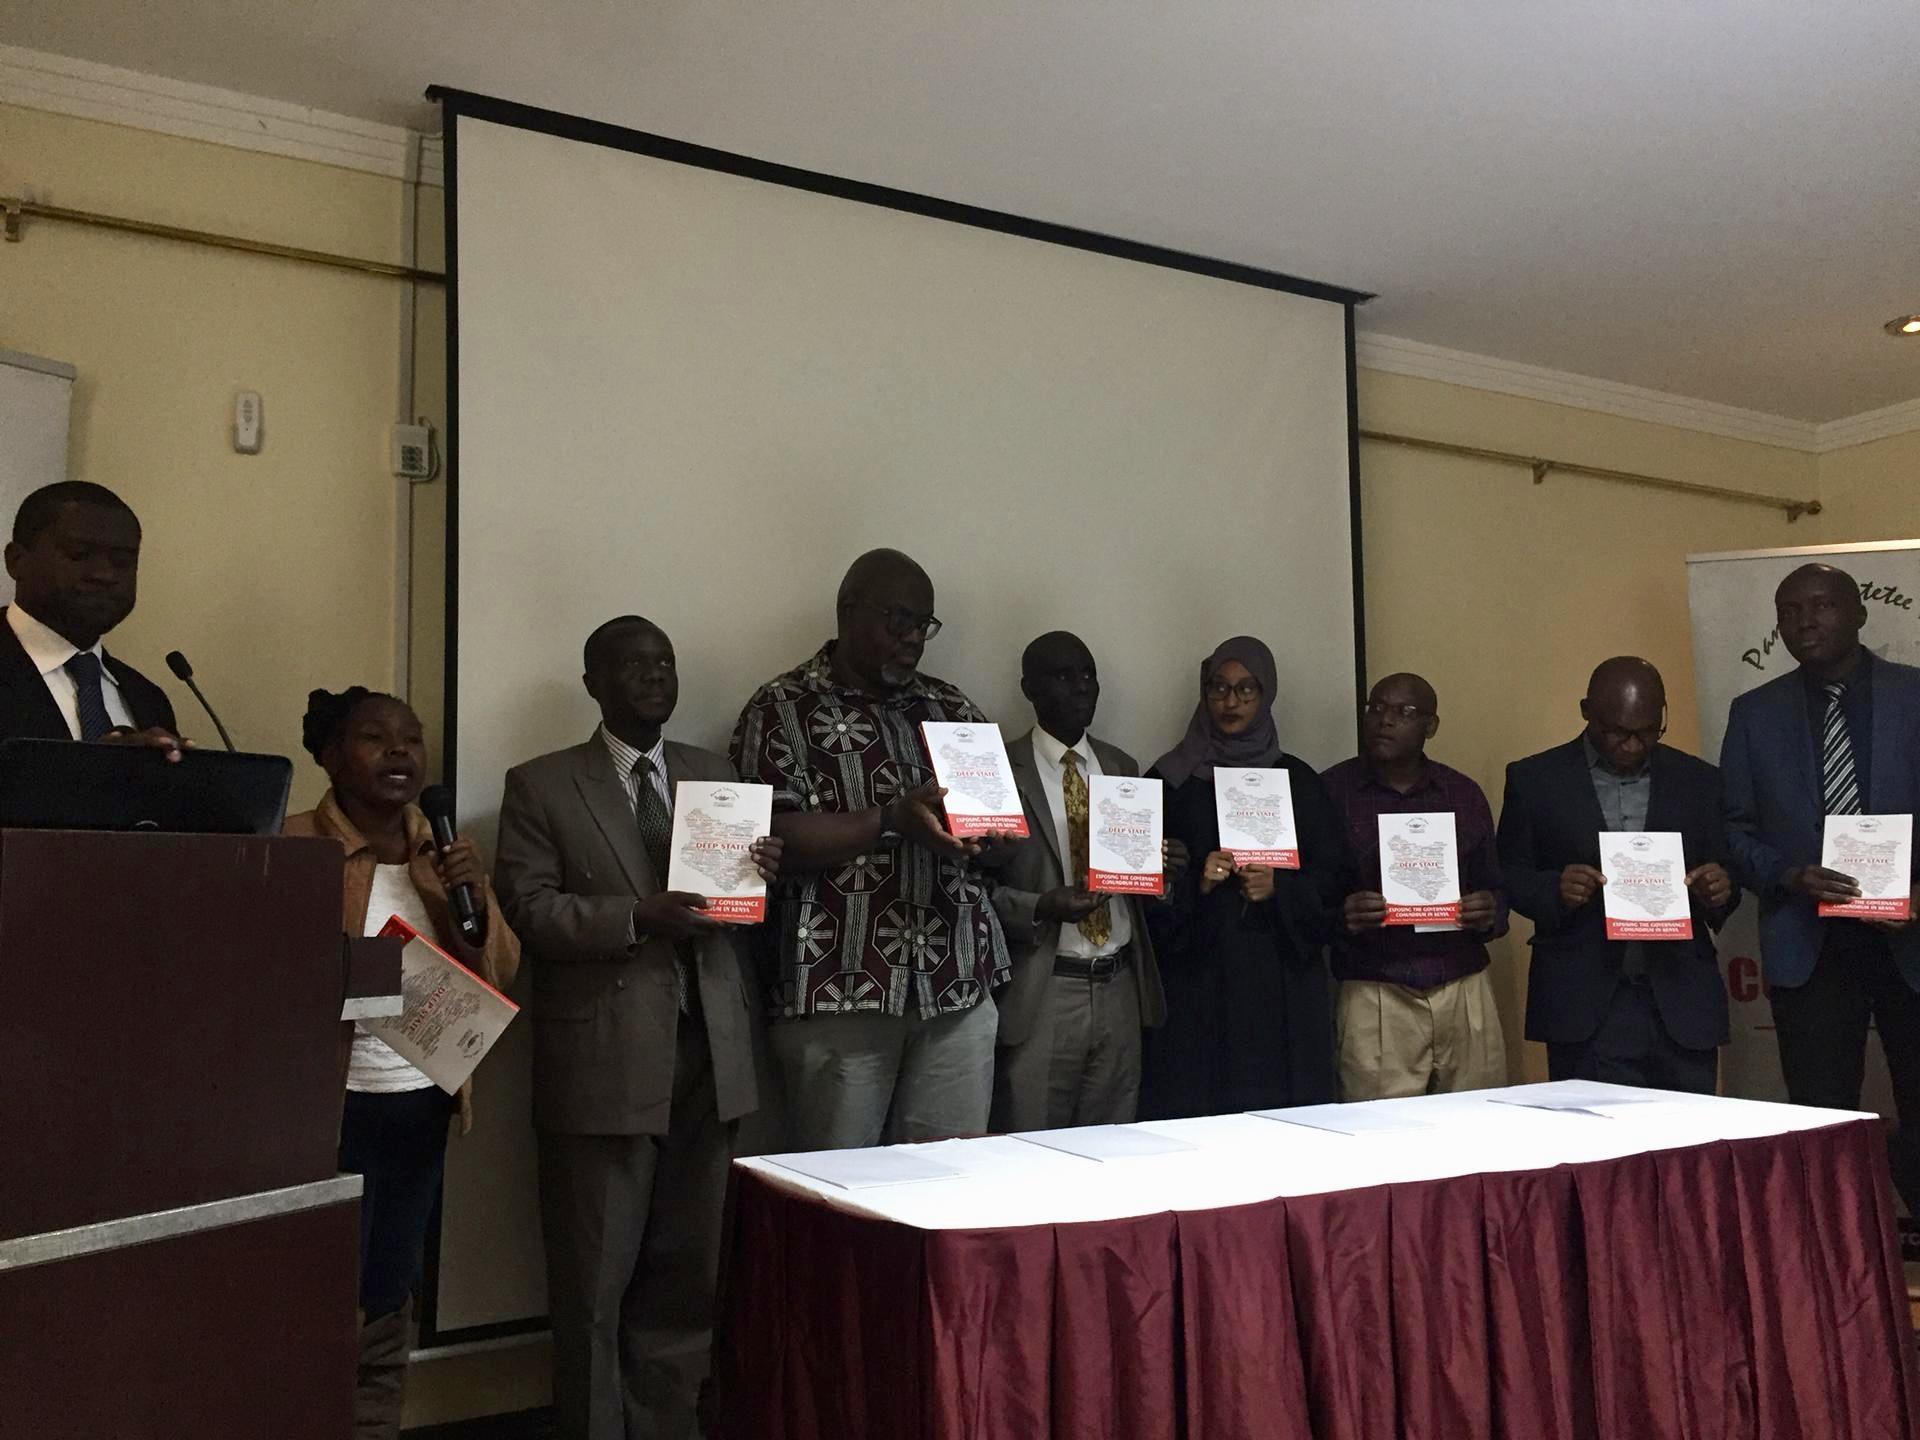 ISLP International Senior Lawyers Project